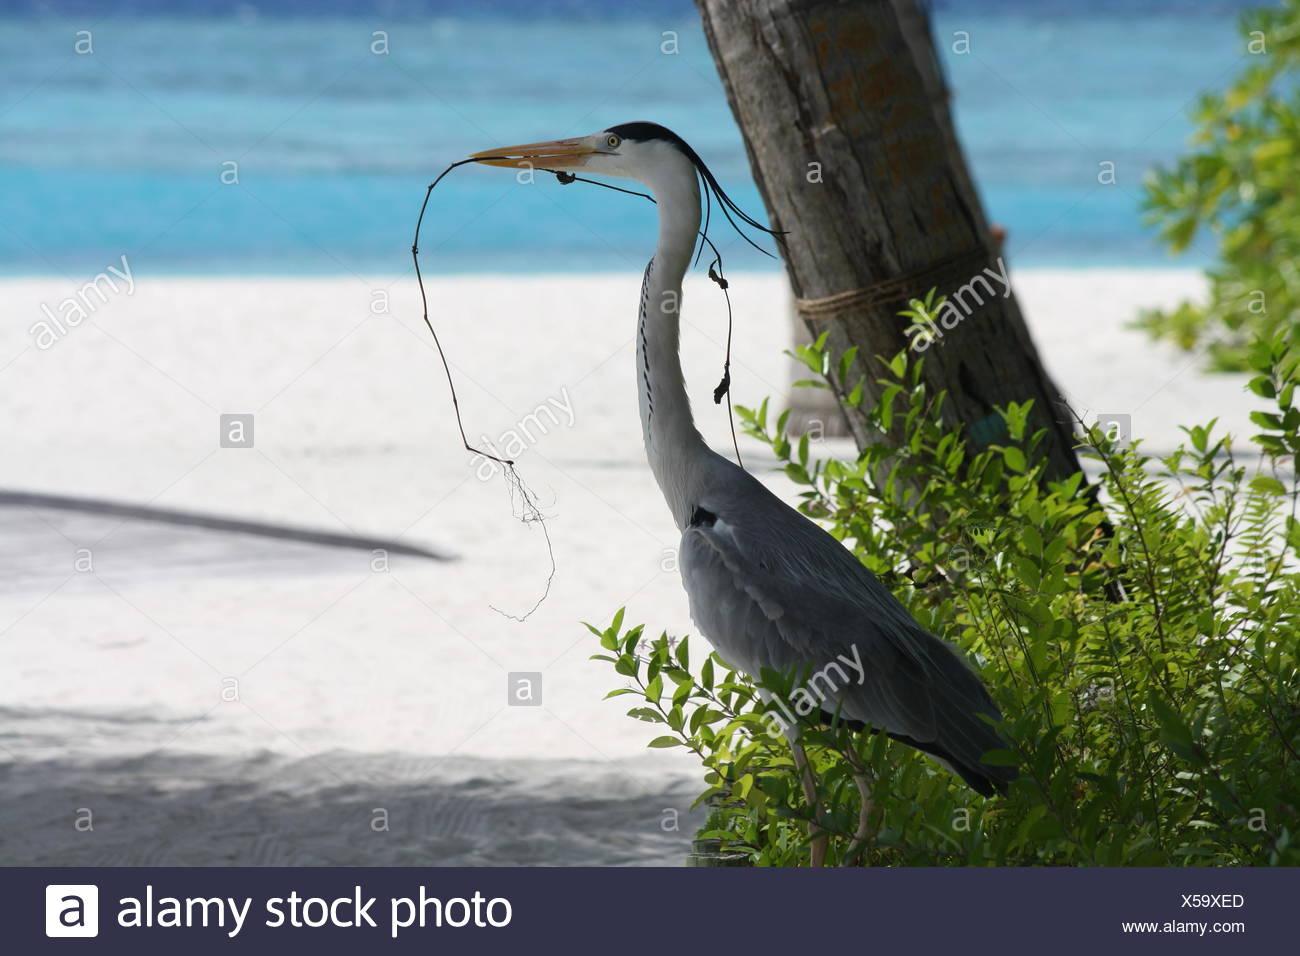 Bird Under Tree Holding Twig - Stock Image